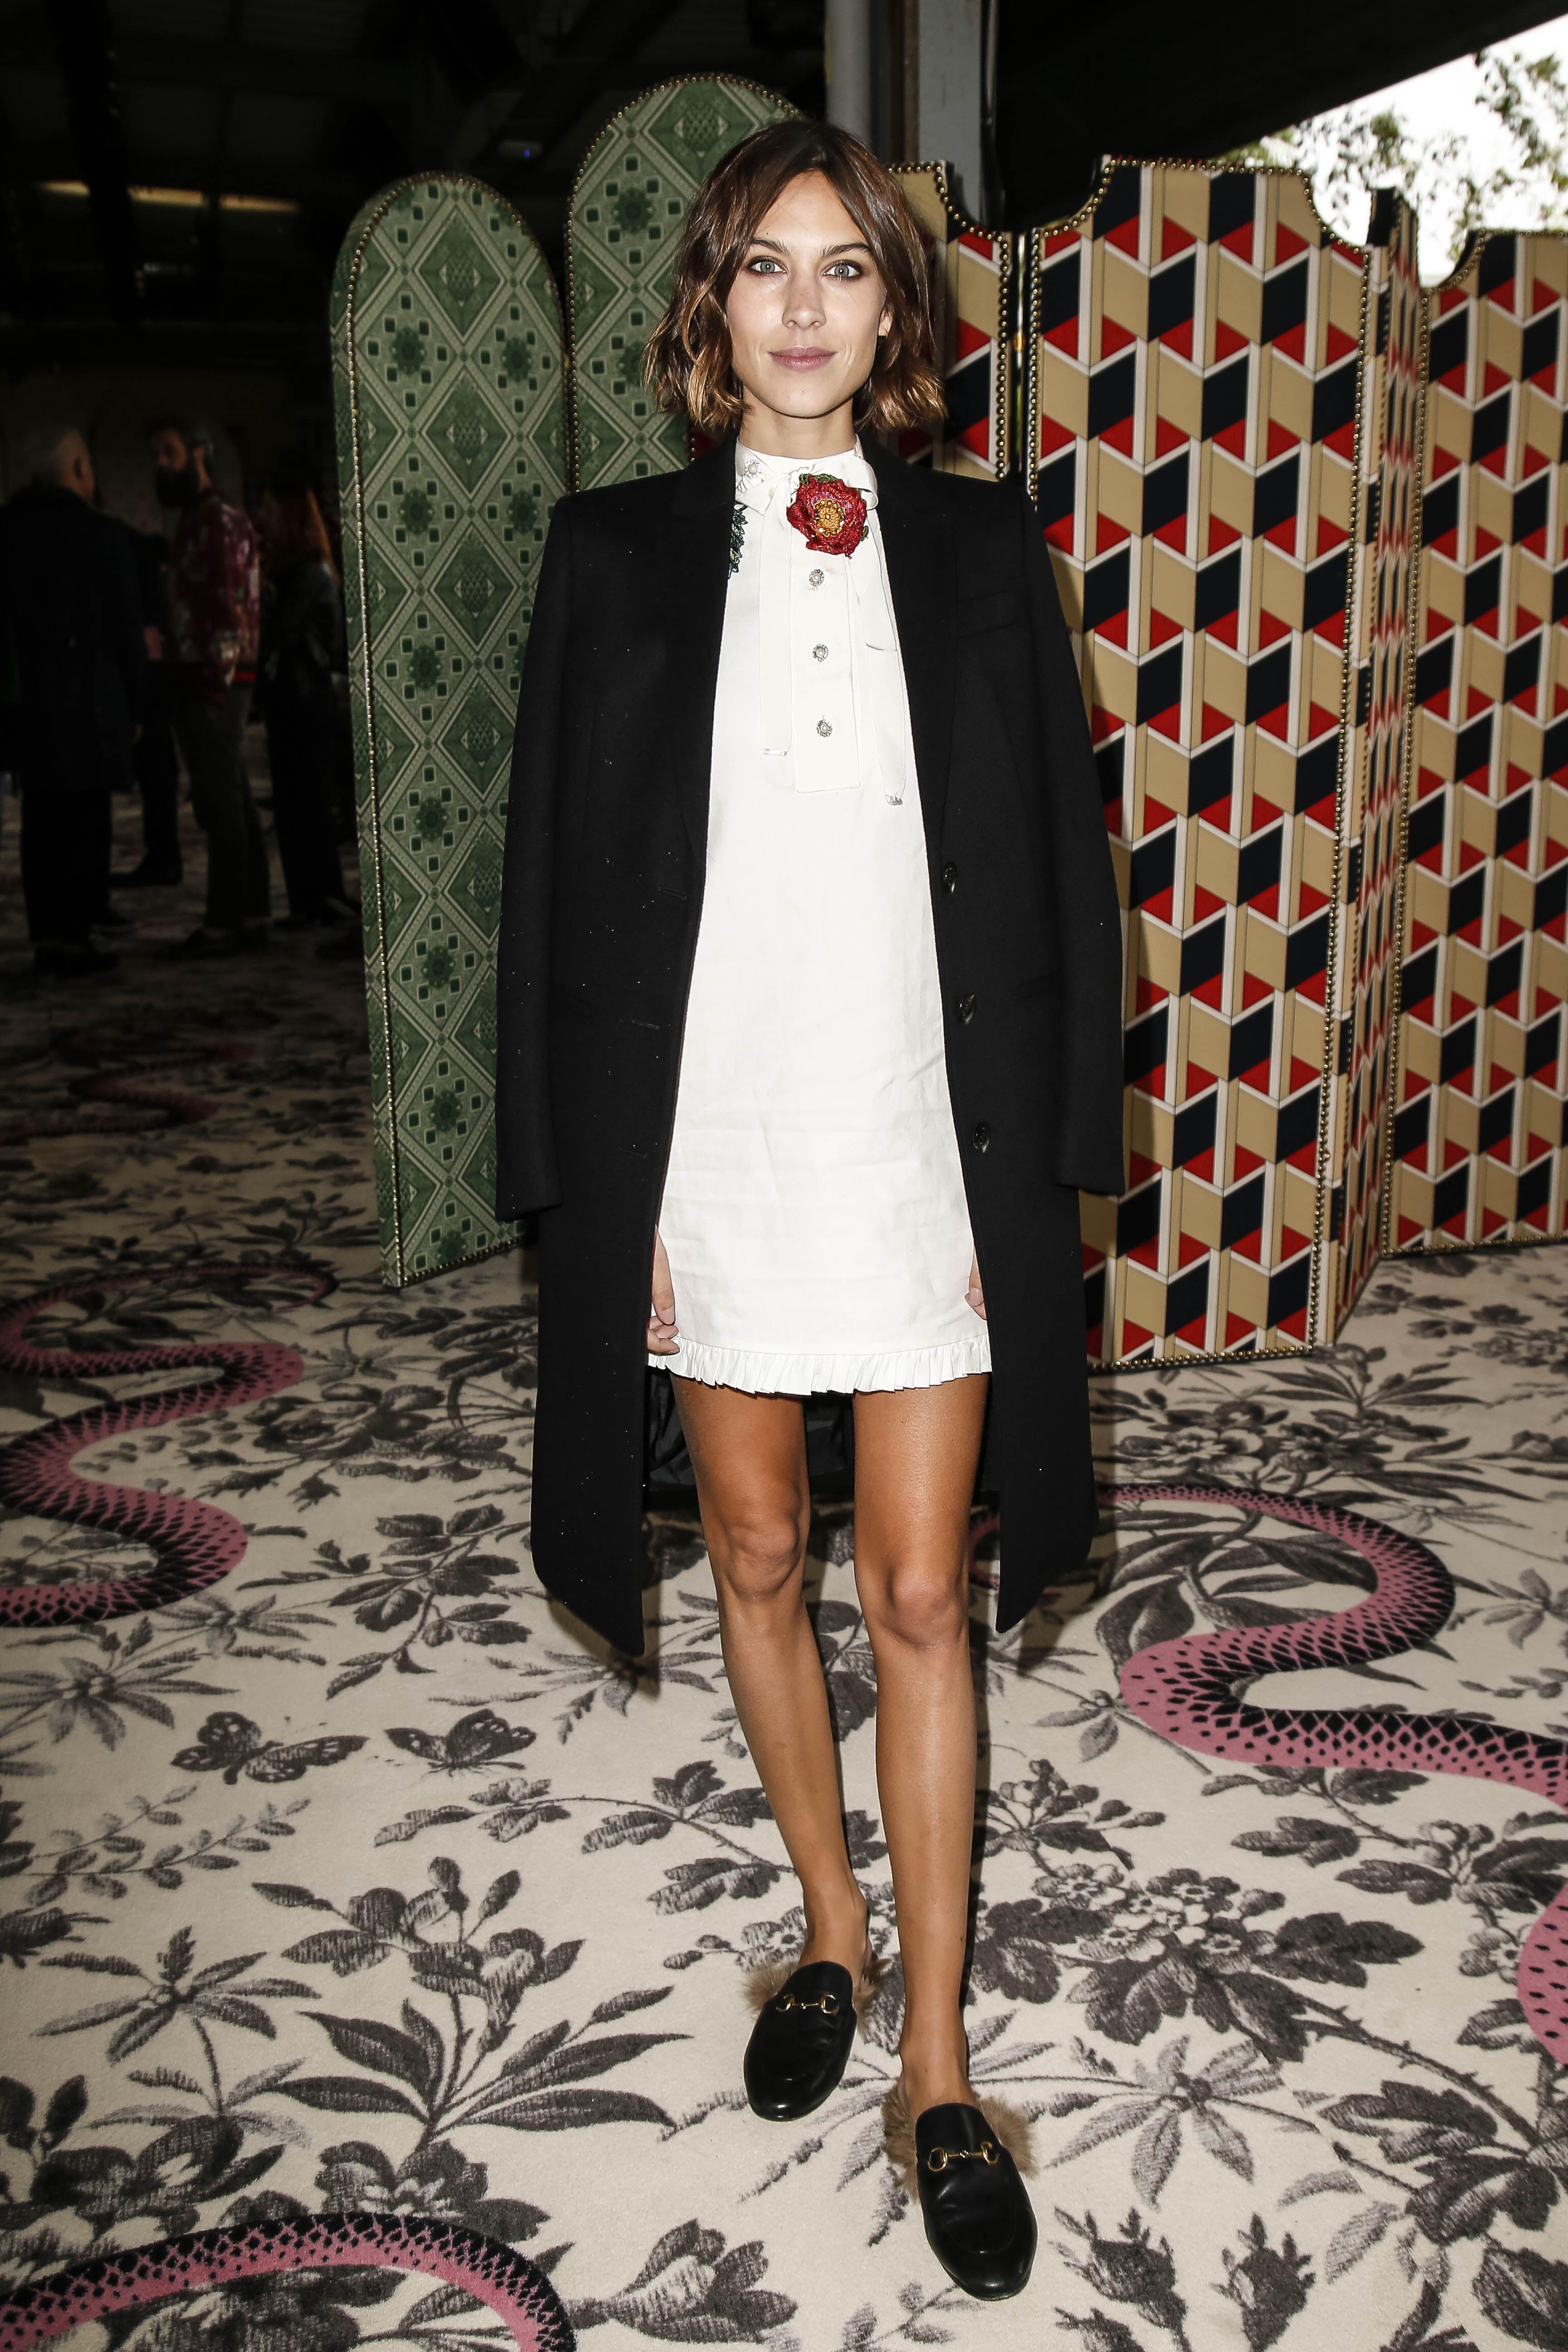 Alexa ChungGucci show, Spring Summer 2016, Milan Fashion Week, Italy - 23 Sep 2015WEARING GUCCI